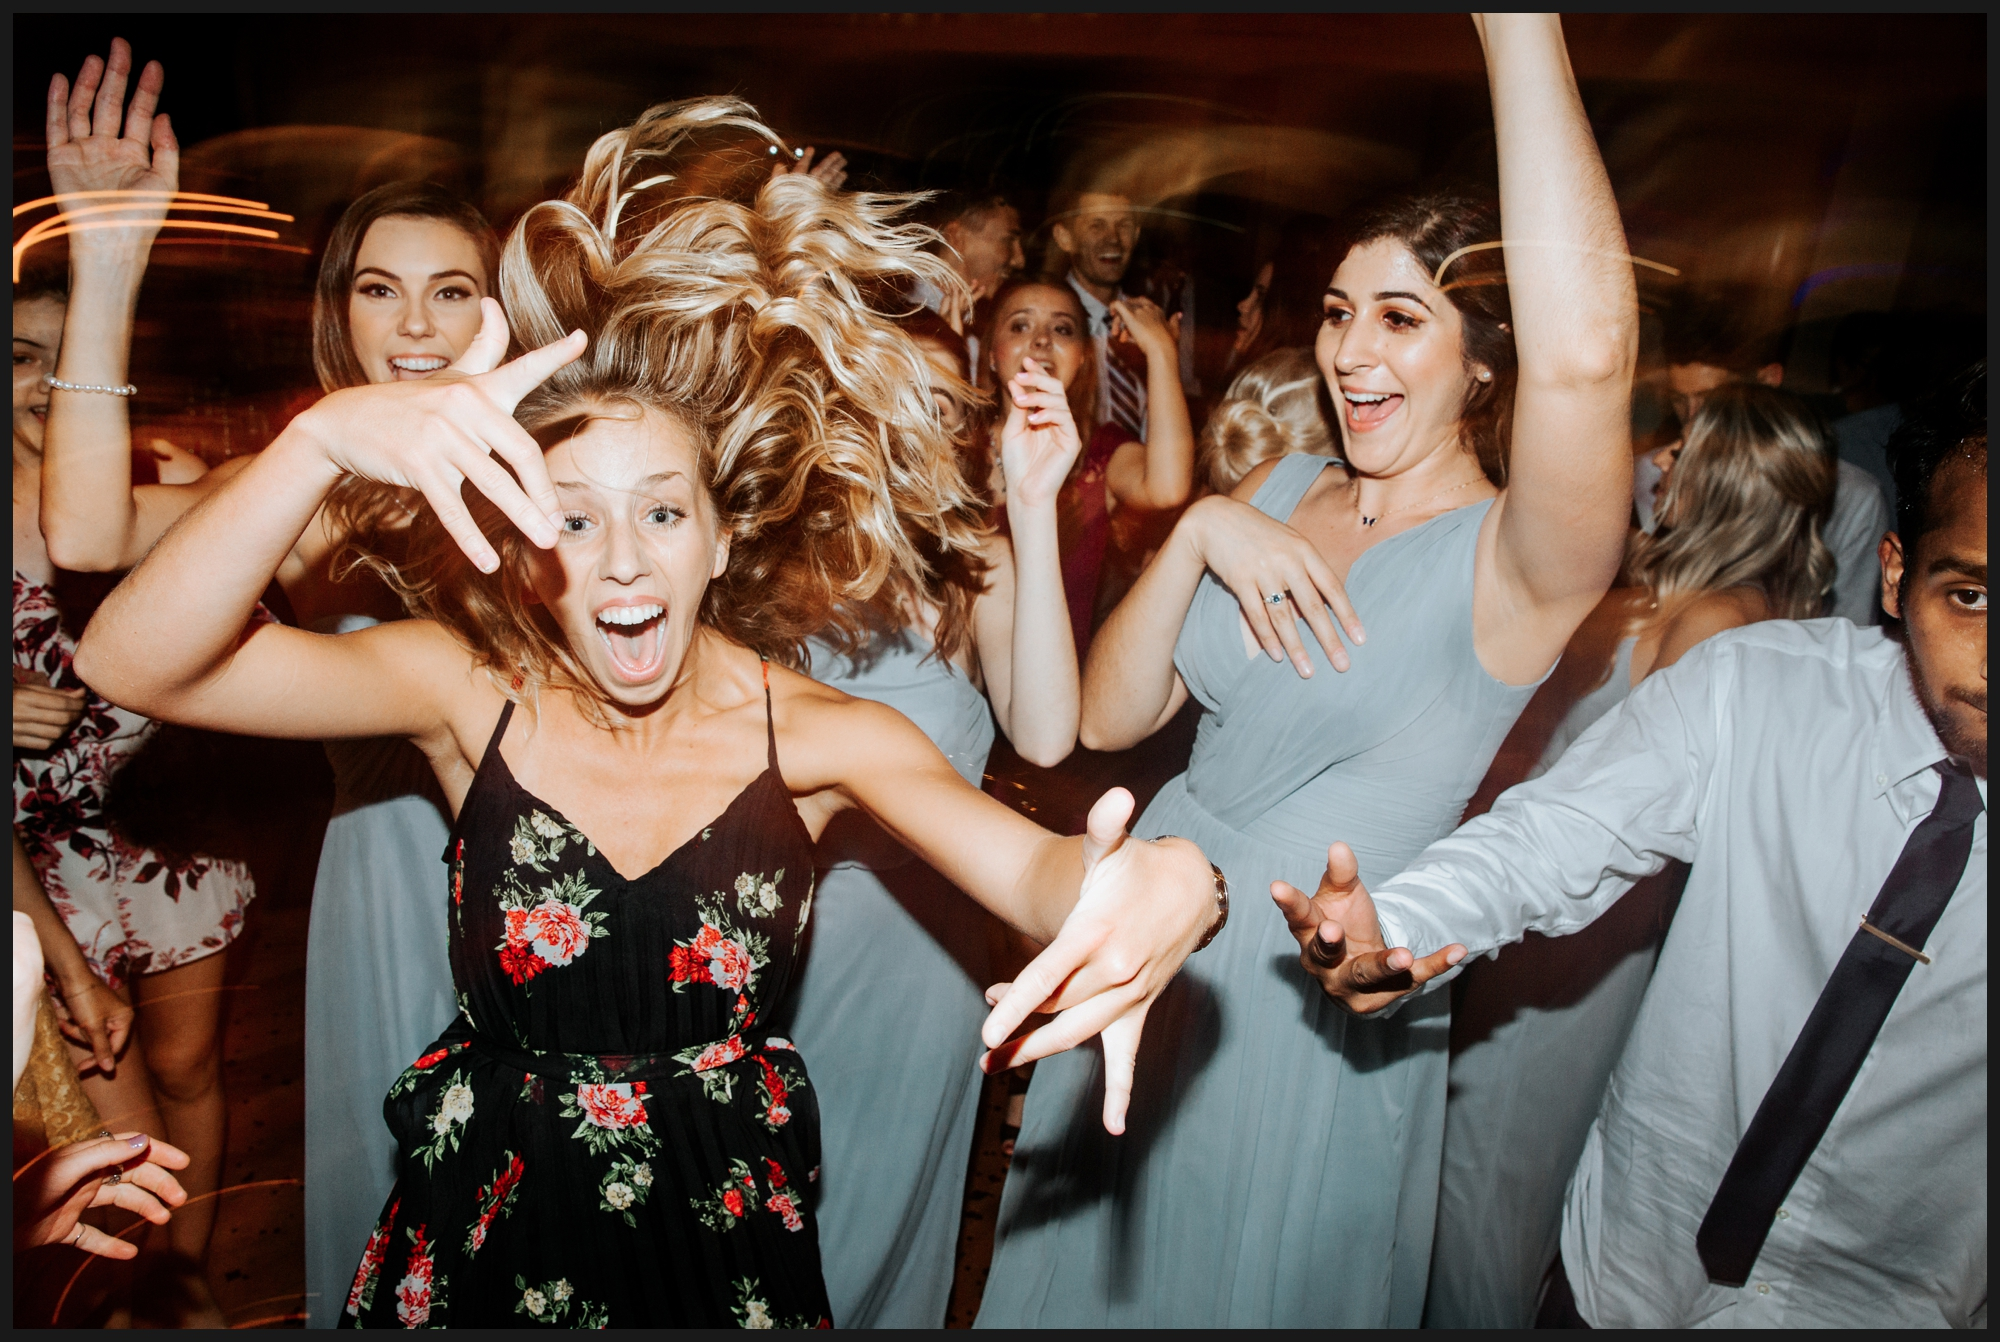 Orlando-Wedding-Photographer-destination-wedding-photographer-florida-wedding-photographer-bohemian-wedding-photographer_0129.jpg